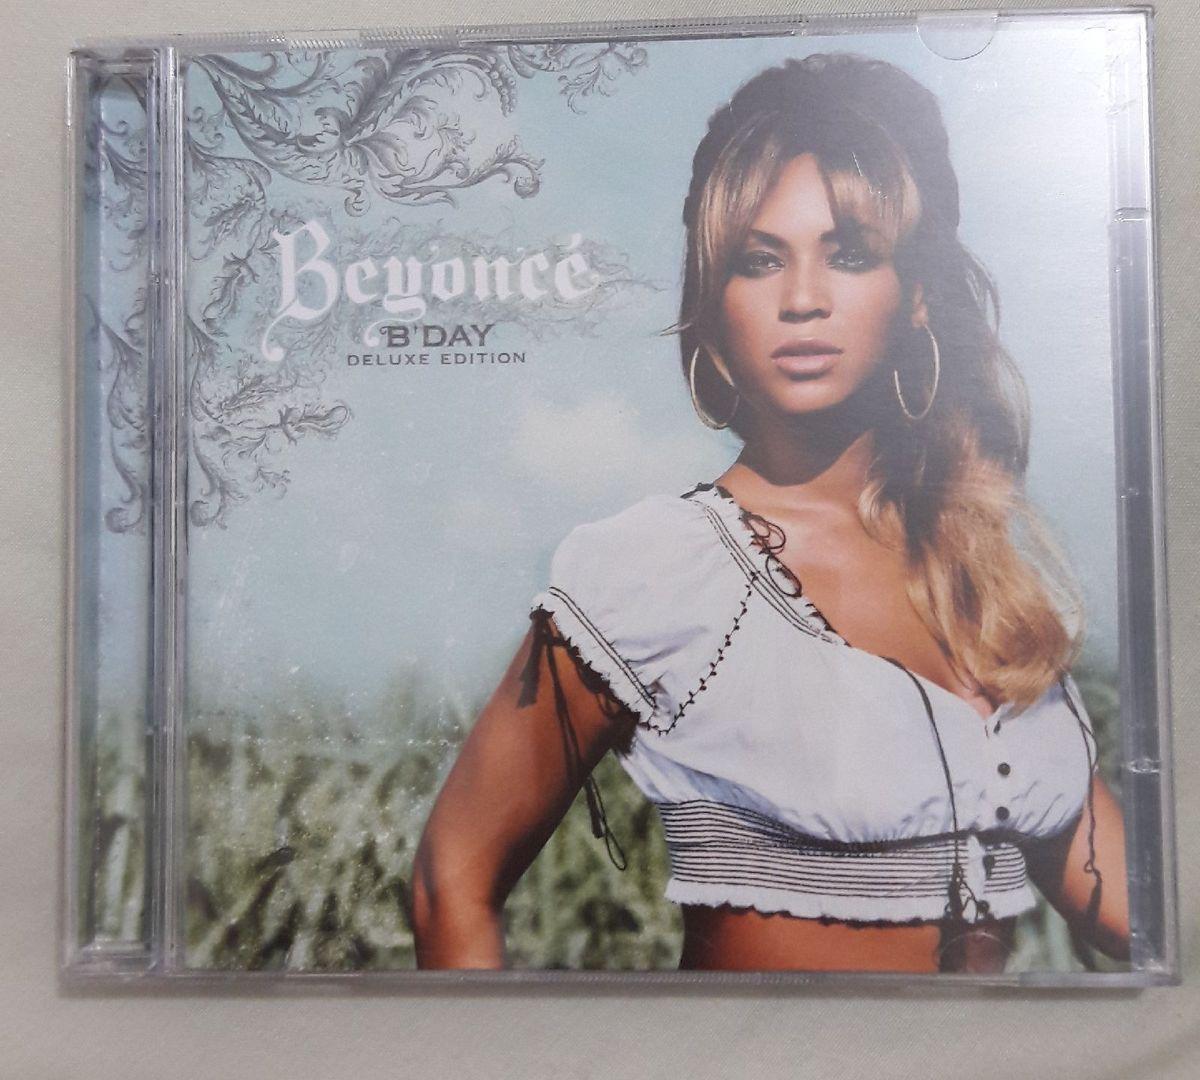 Cd + Dvd Beyoncé - B'day Deluxe Edition | Item de Música ...